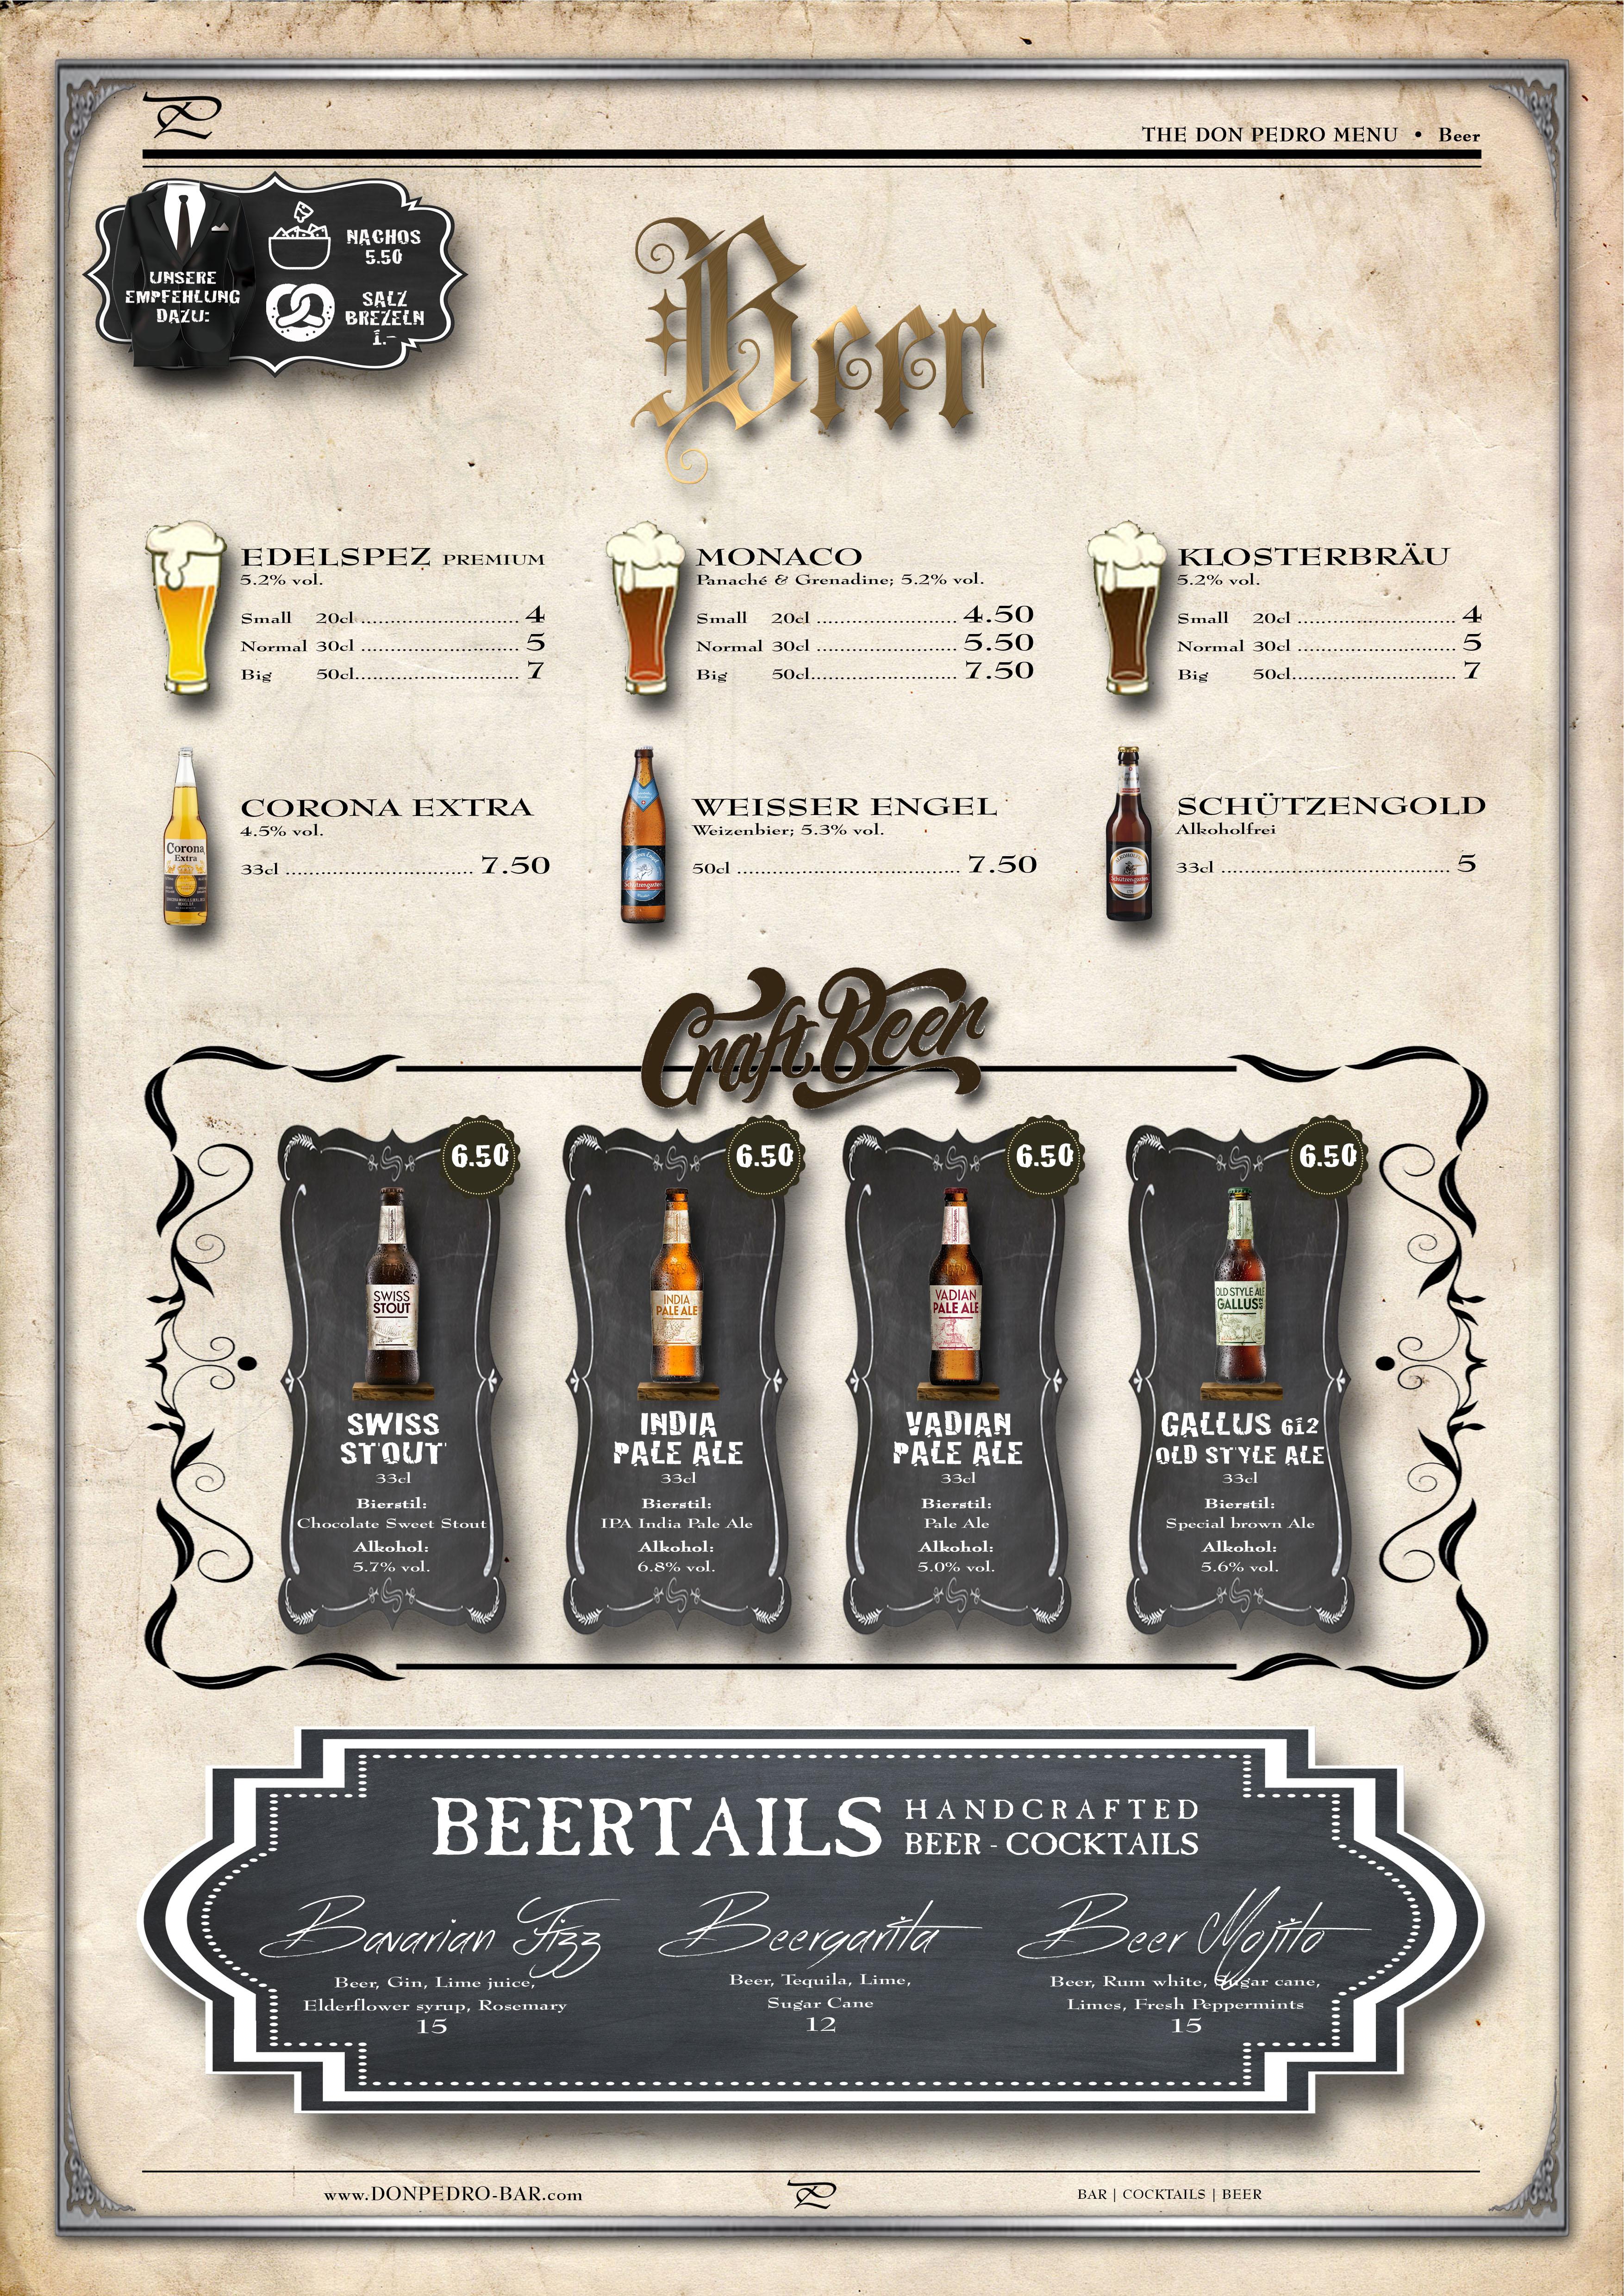 THE DON PEDRO MENU Beer